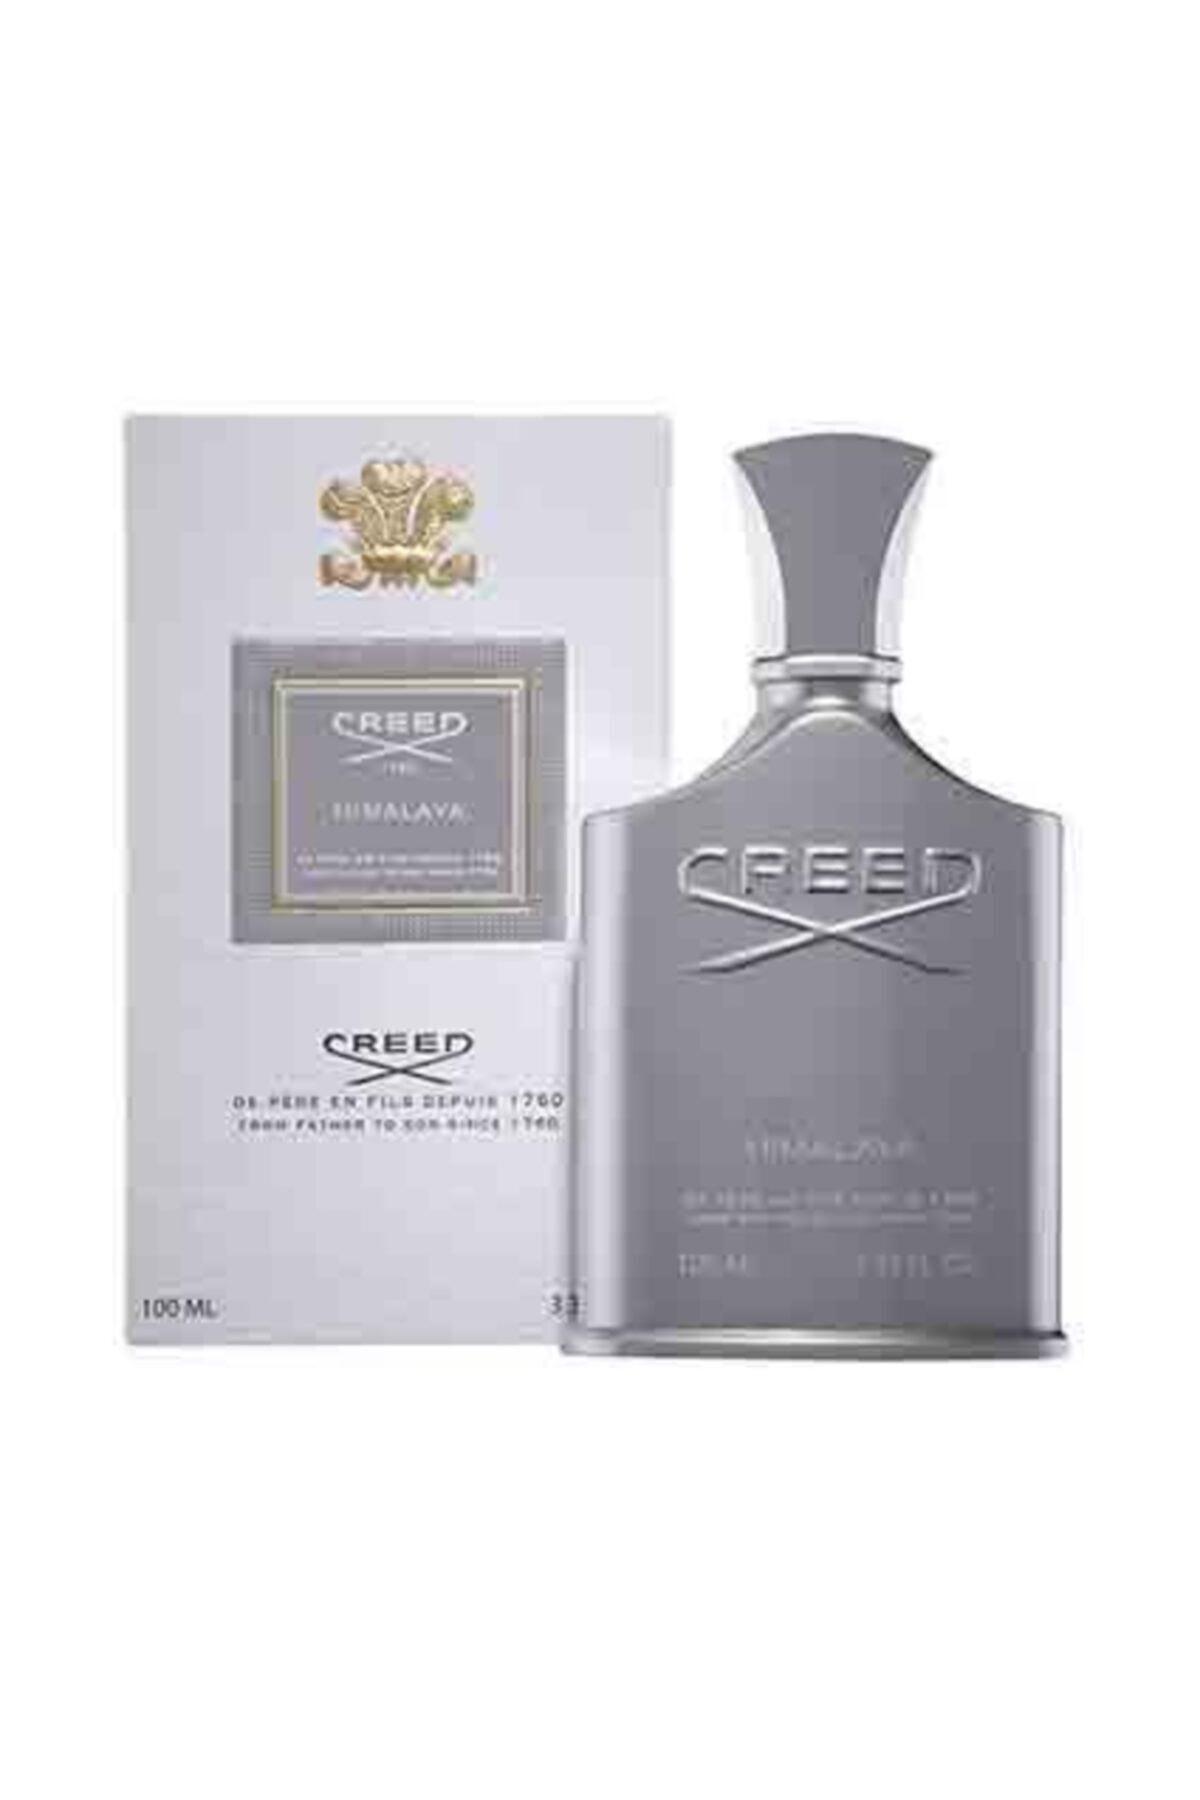 Creed Himalaya Edp 100 ml Erkek Parfüm 3508441001084 2